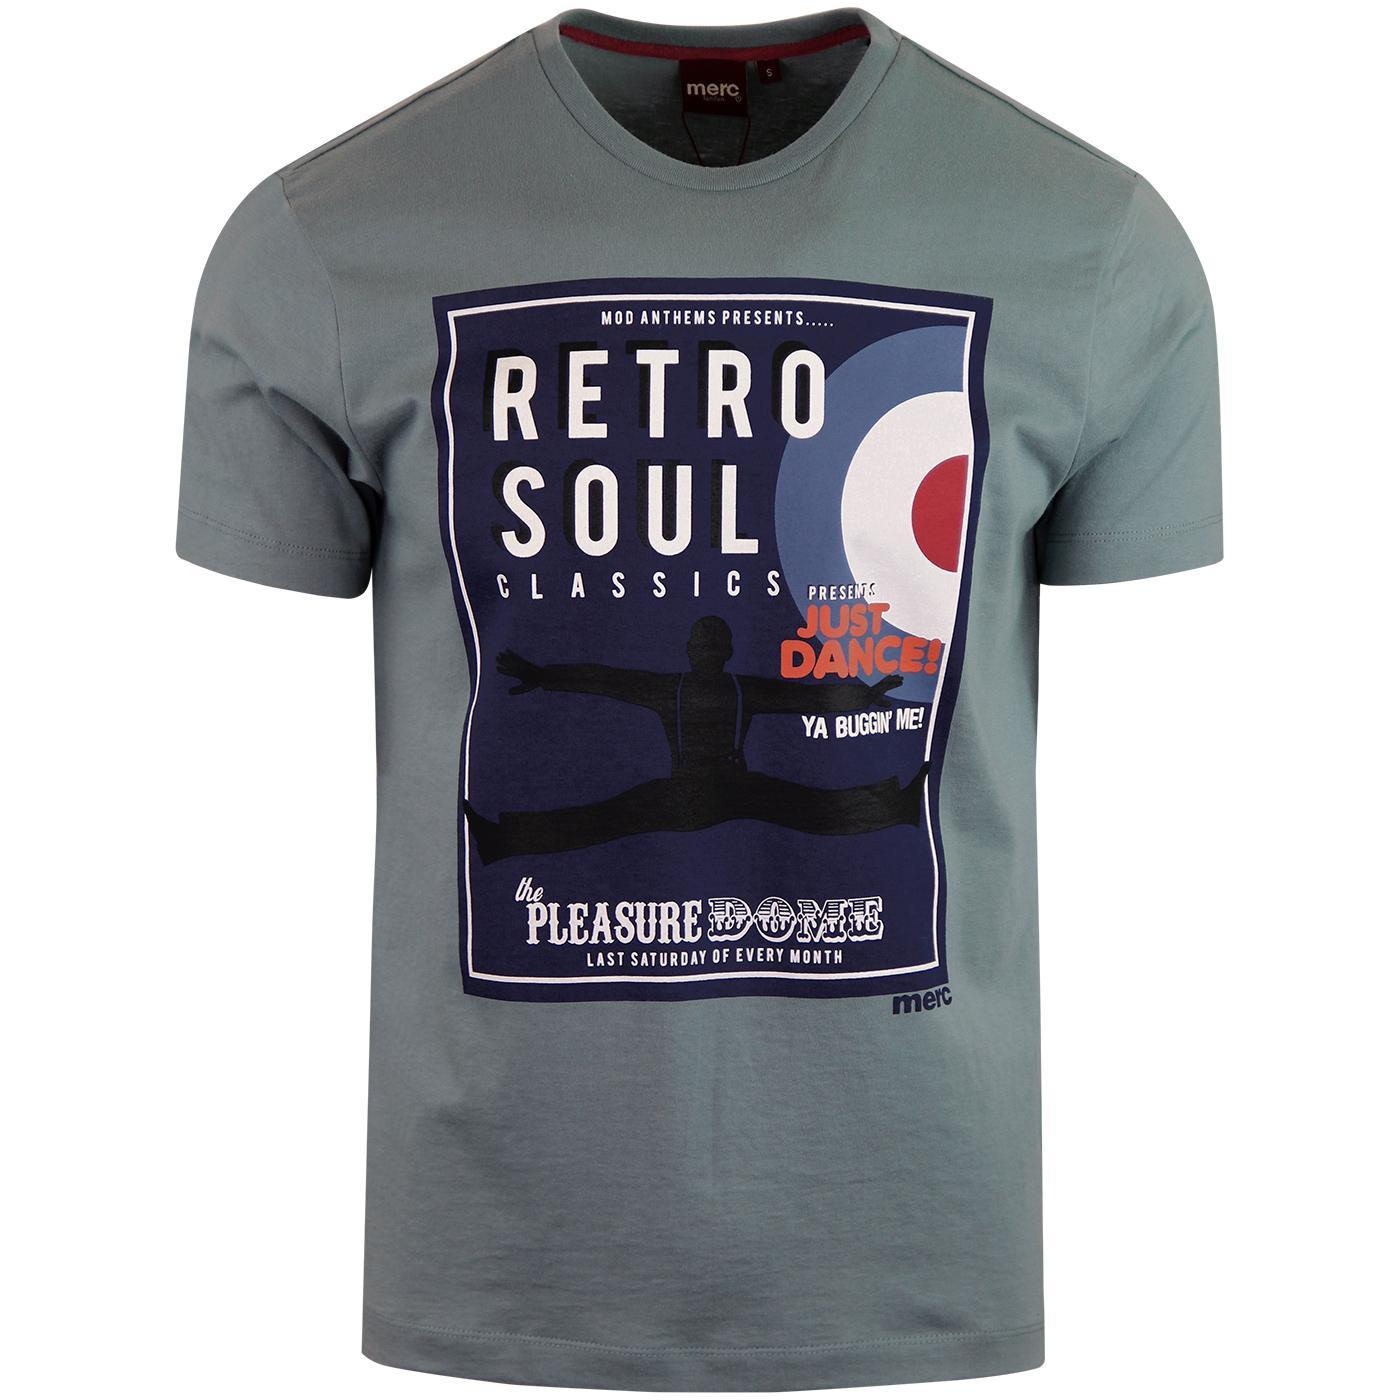 Palmer MERC Mod Soul Graphic T-shirt (Slate Blue)